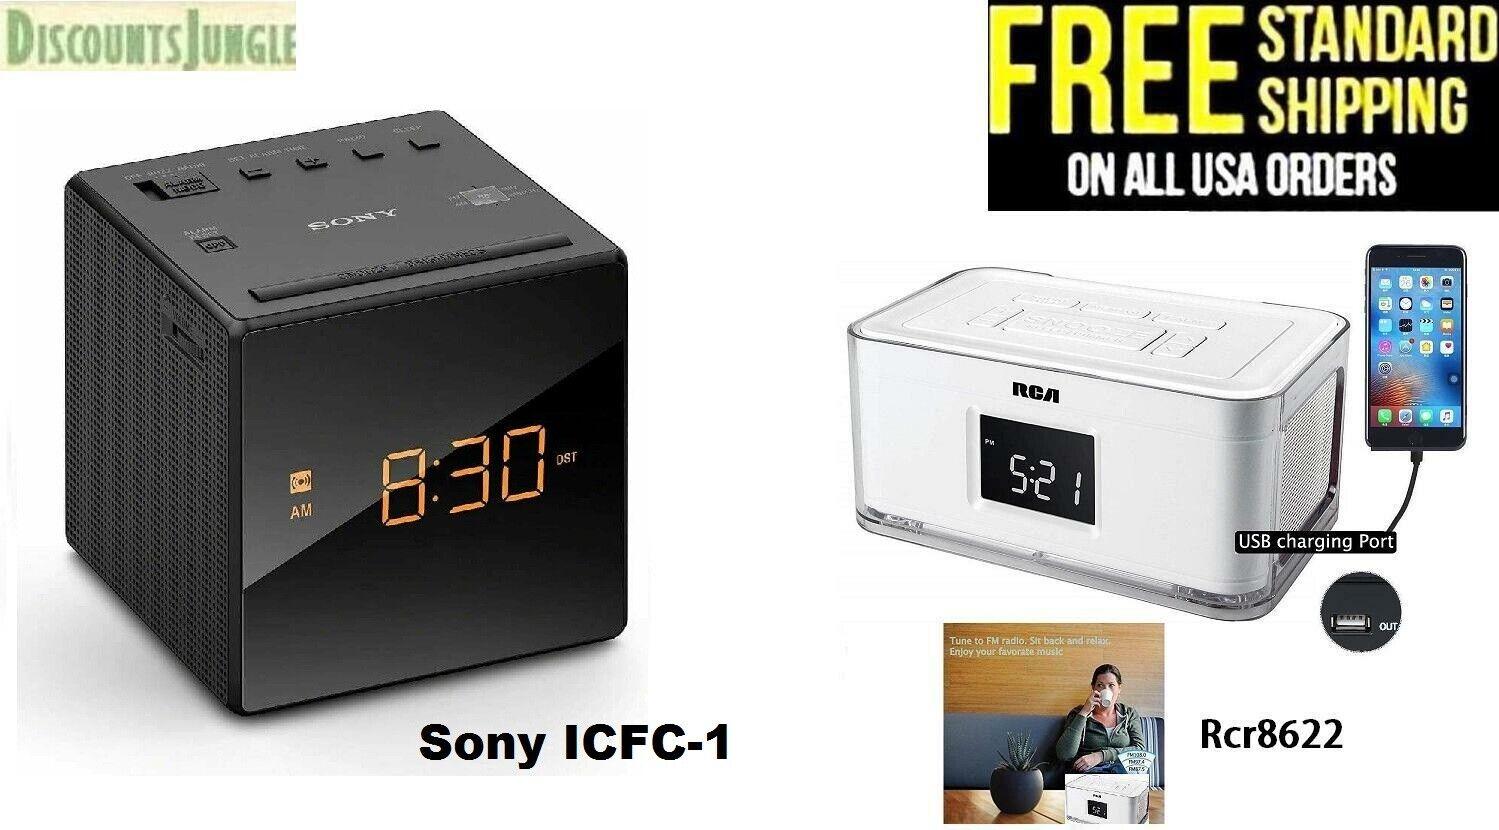 Emerson CKS1708 Smart automatic time setting Alarm Clock Rad